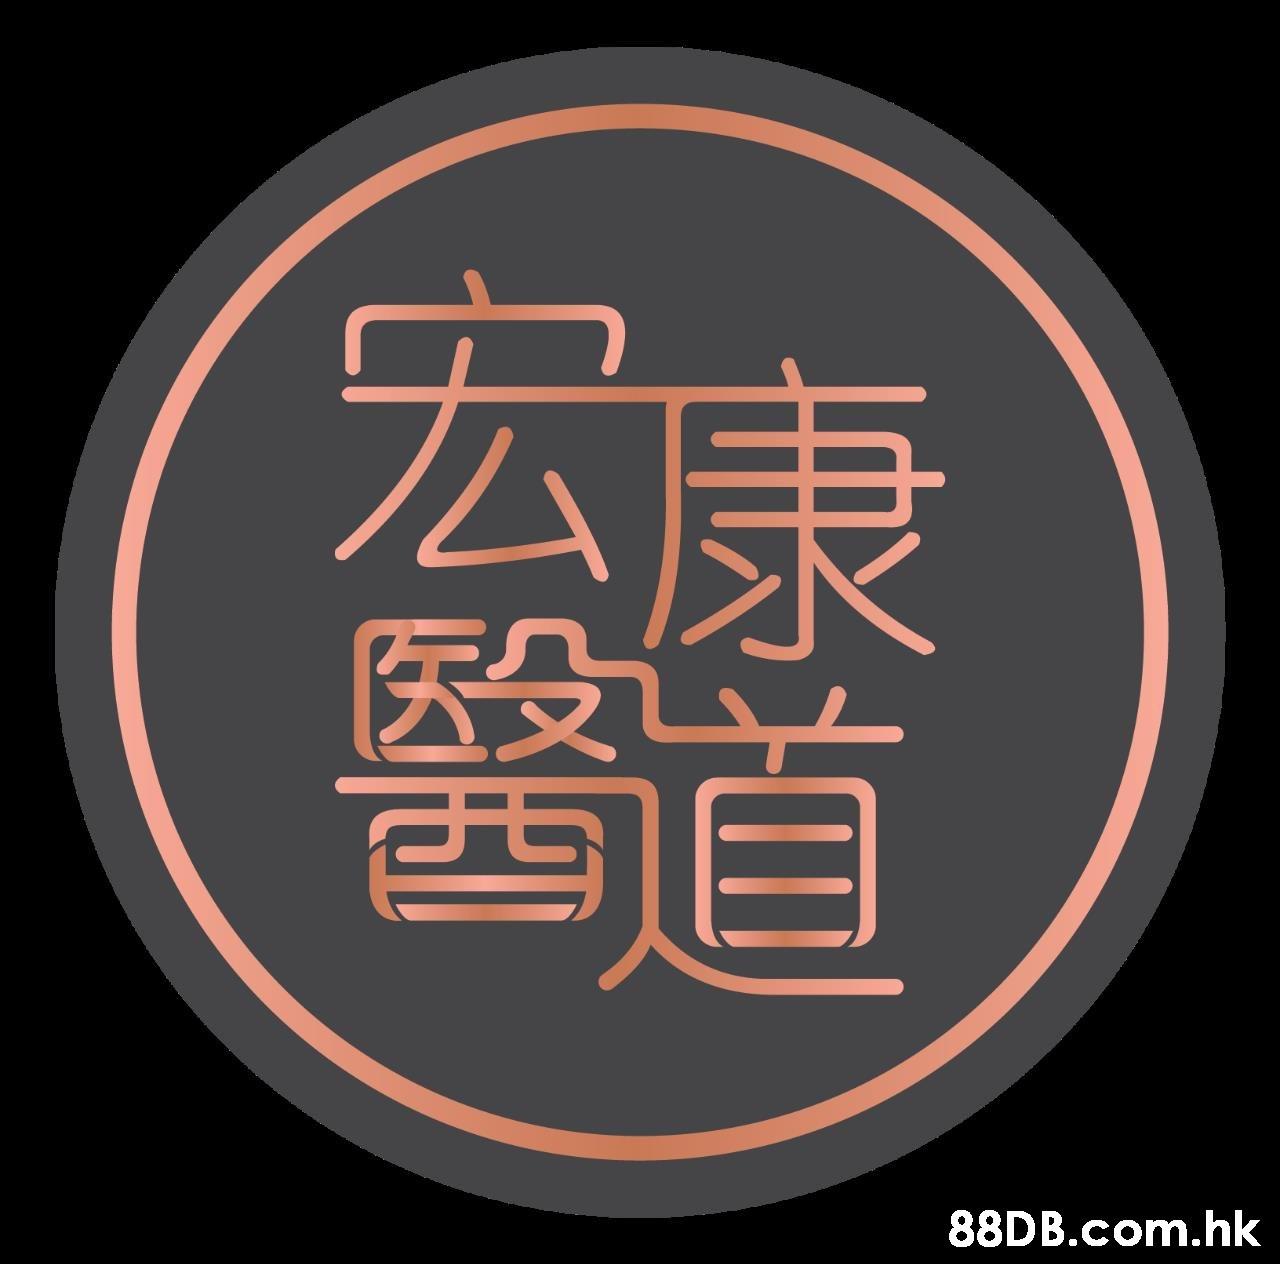 .hk  Font,Text,Logo,Circle